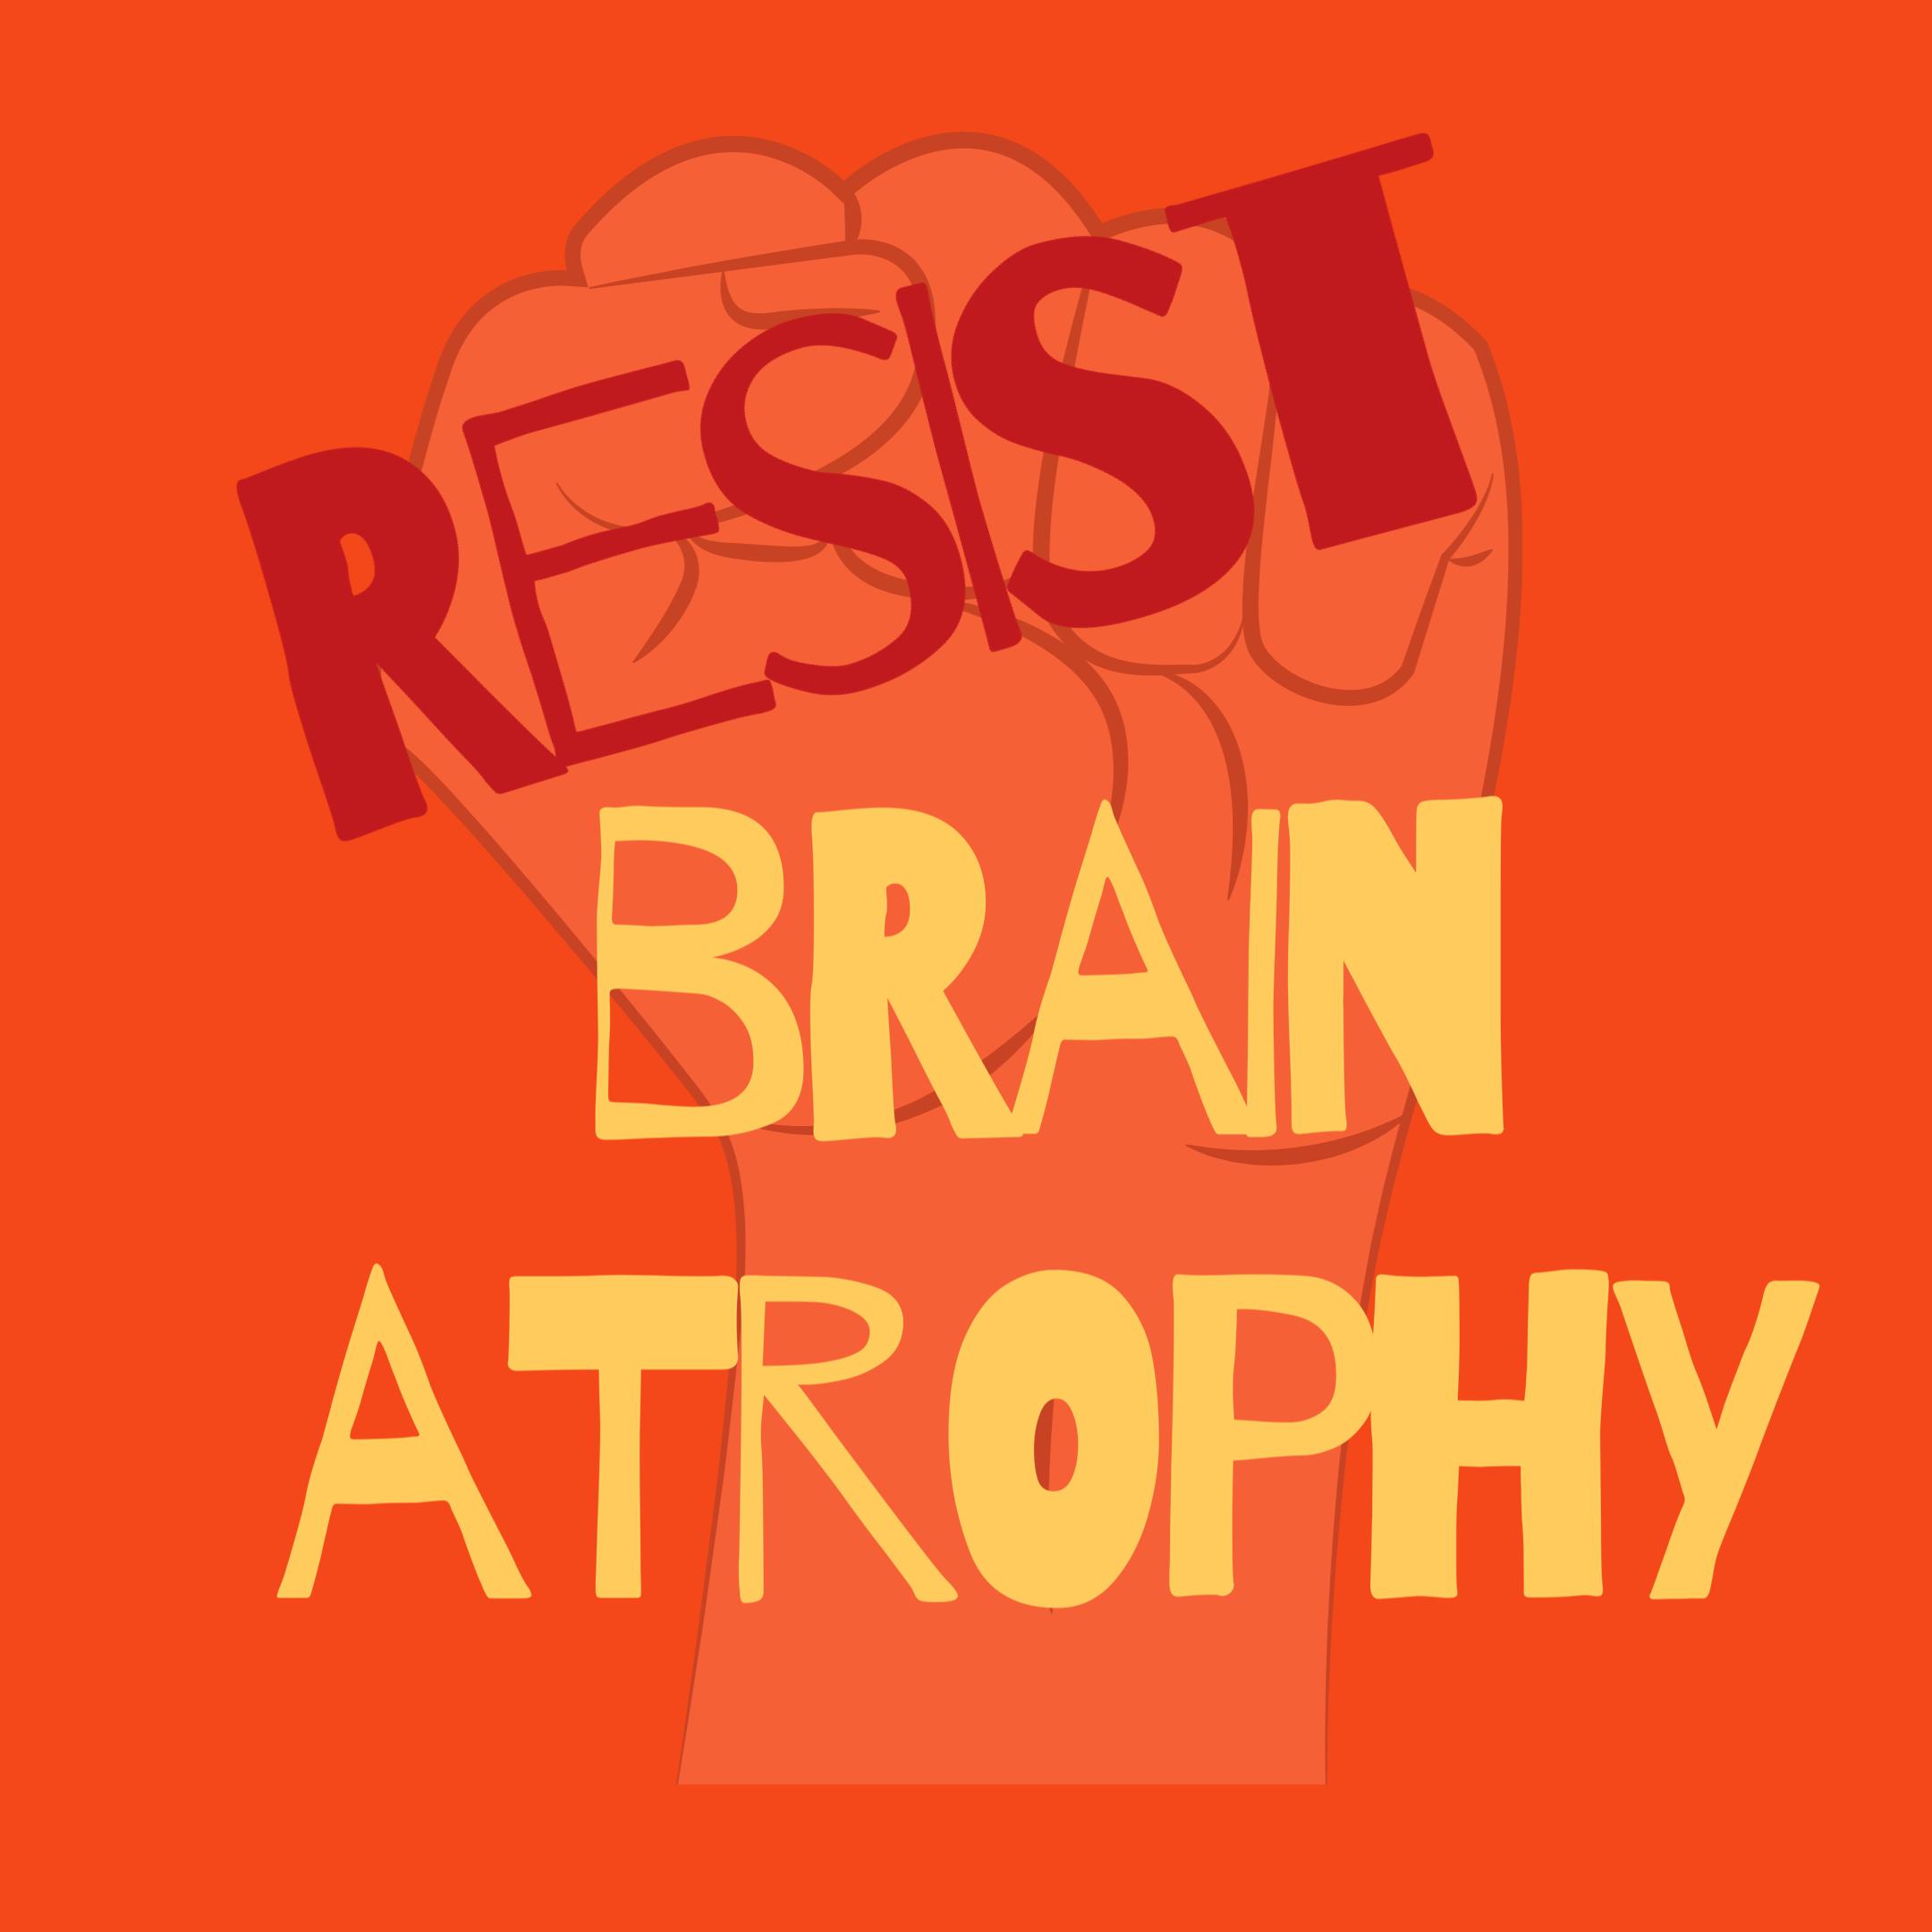 fist on red background behind words resist brain atrophy